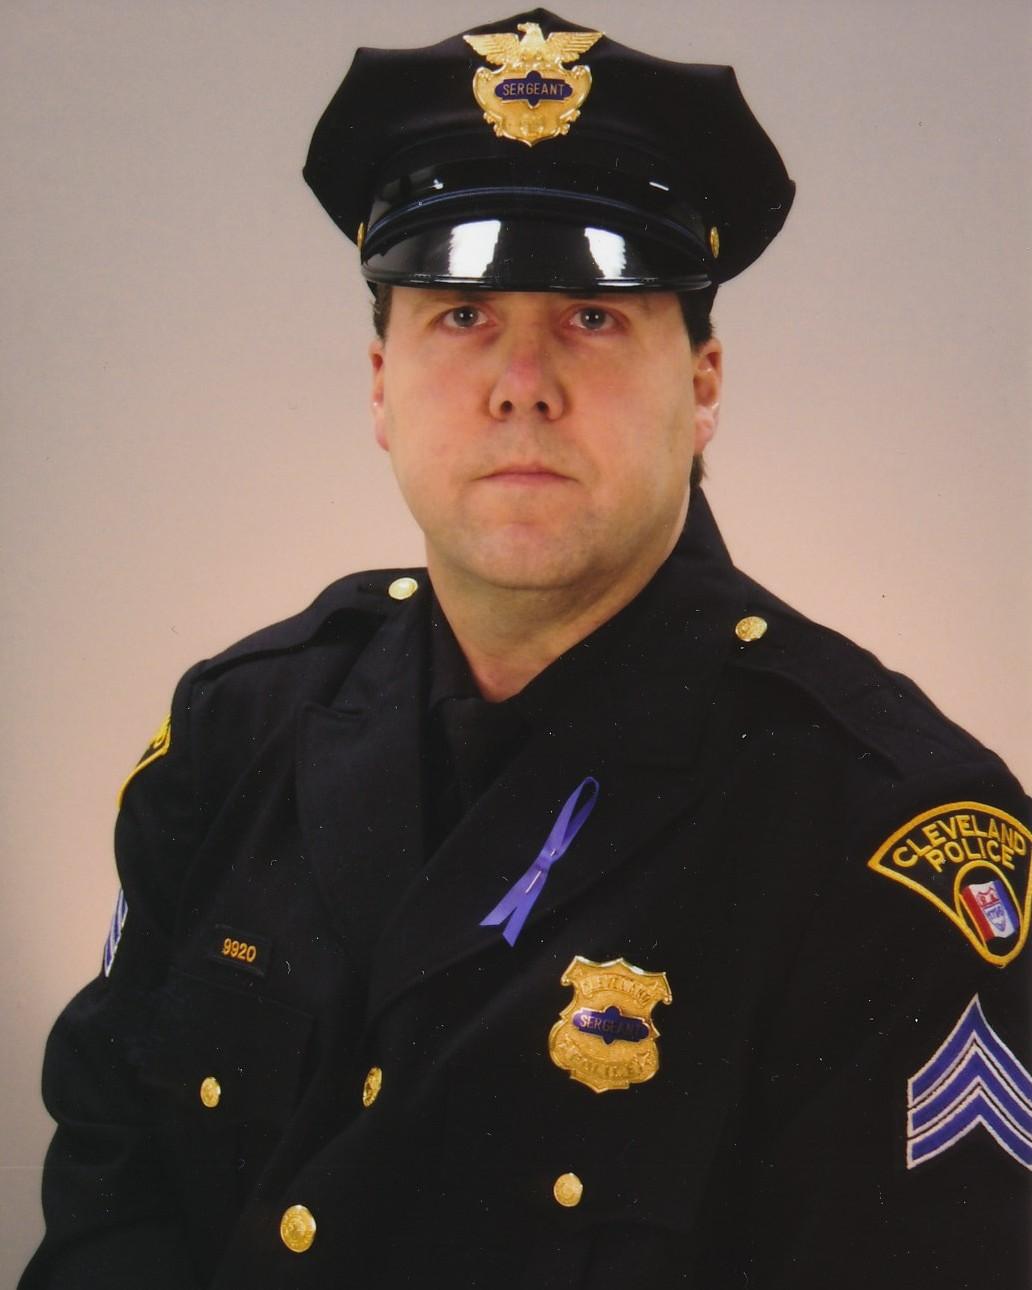 Sergeant Martin Arnold Stanton | Cleveland Division of Police, Ohio